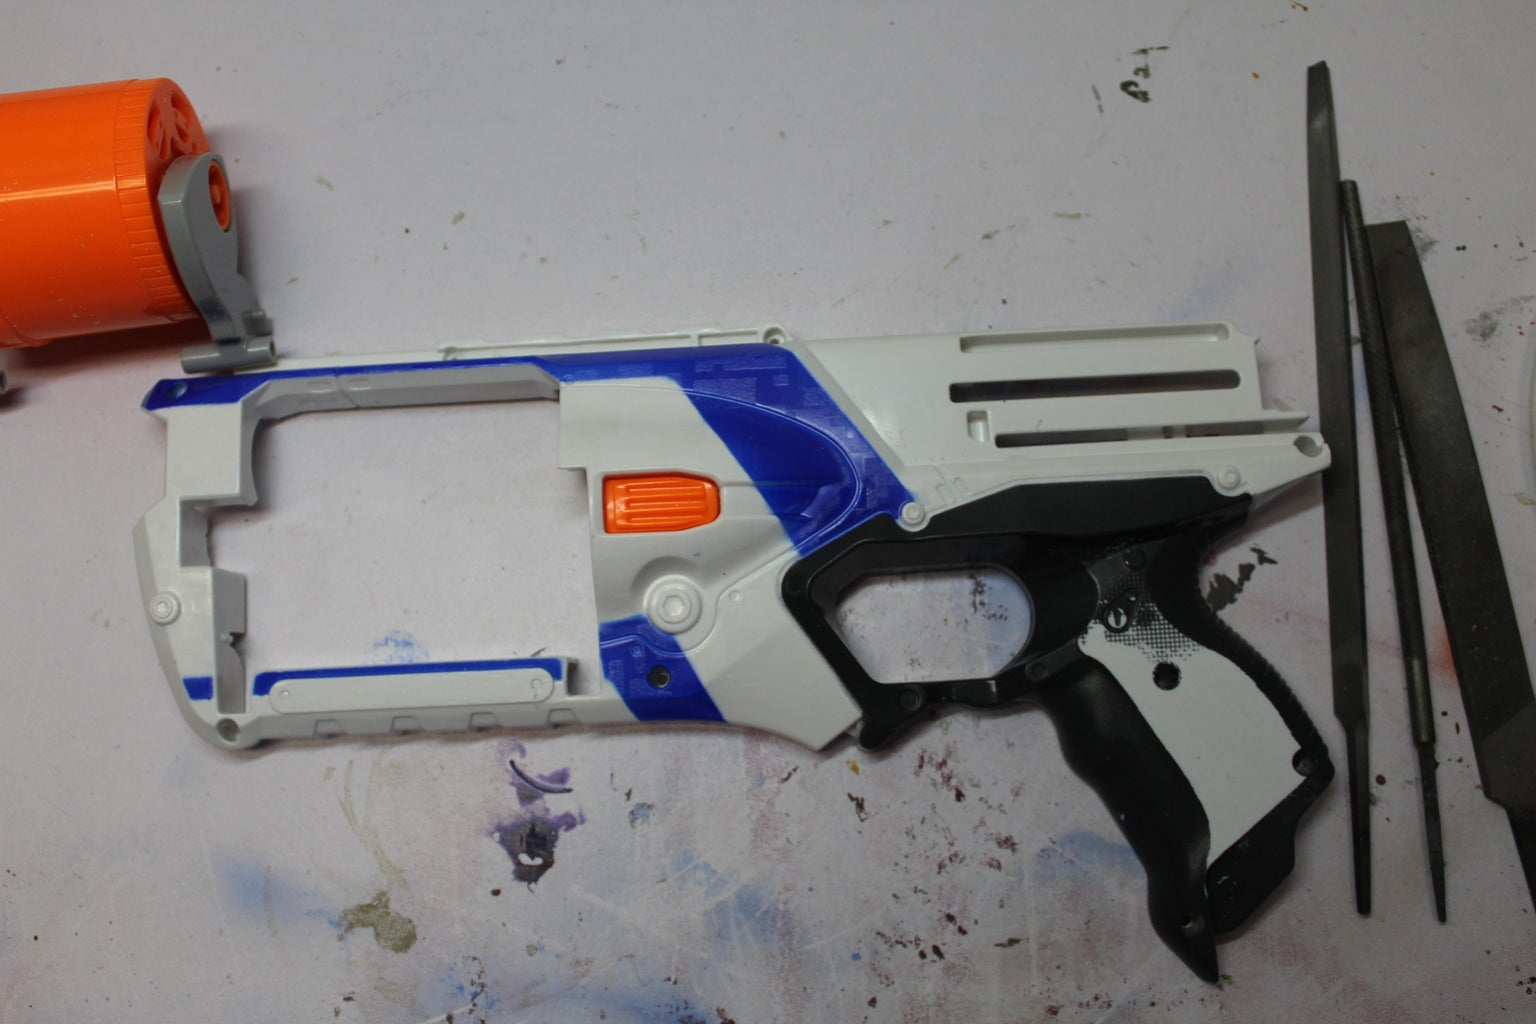 Take the Gun Apart